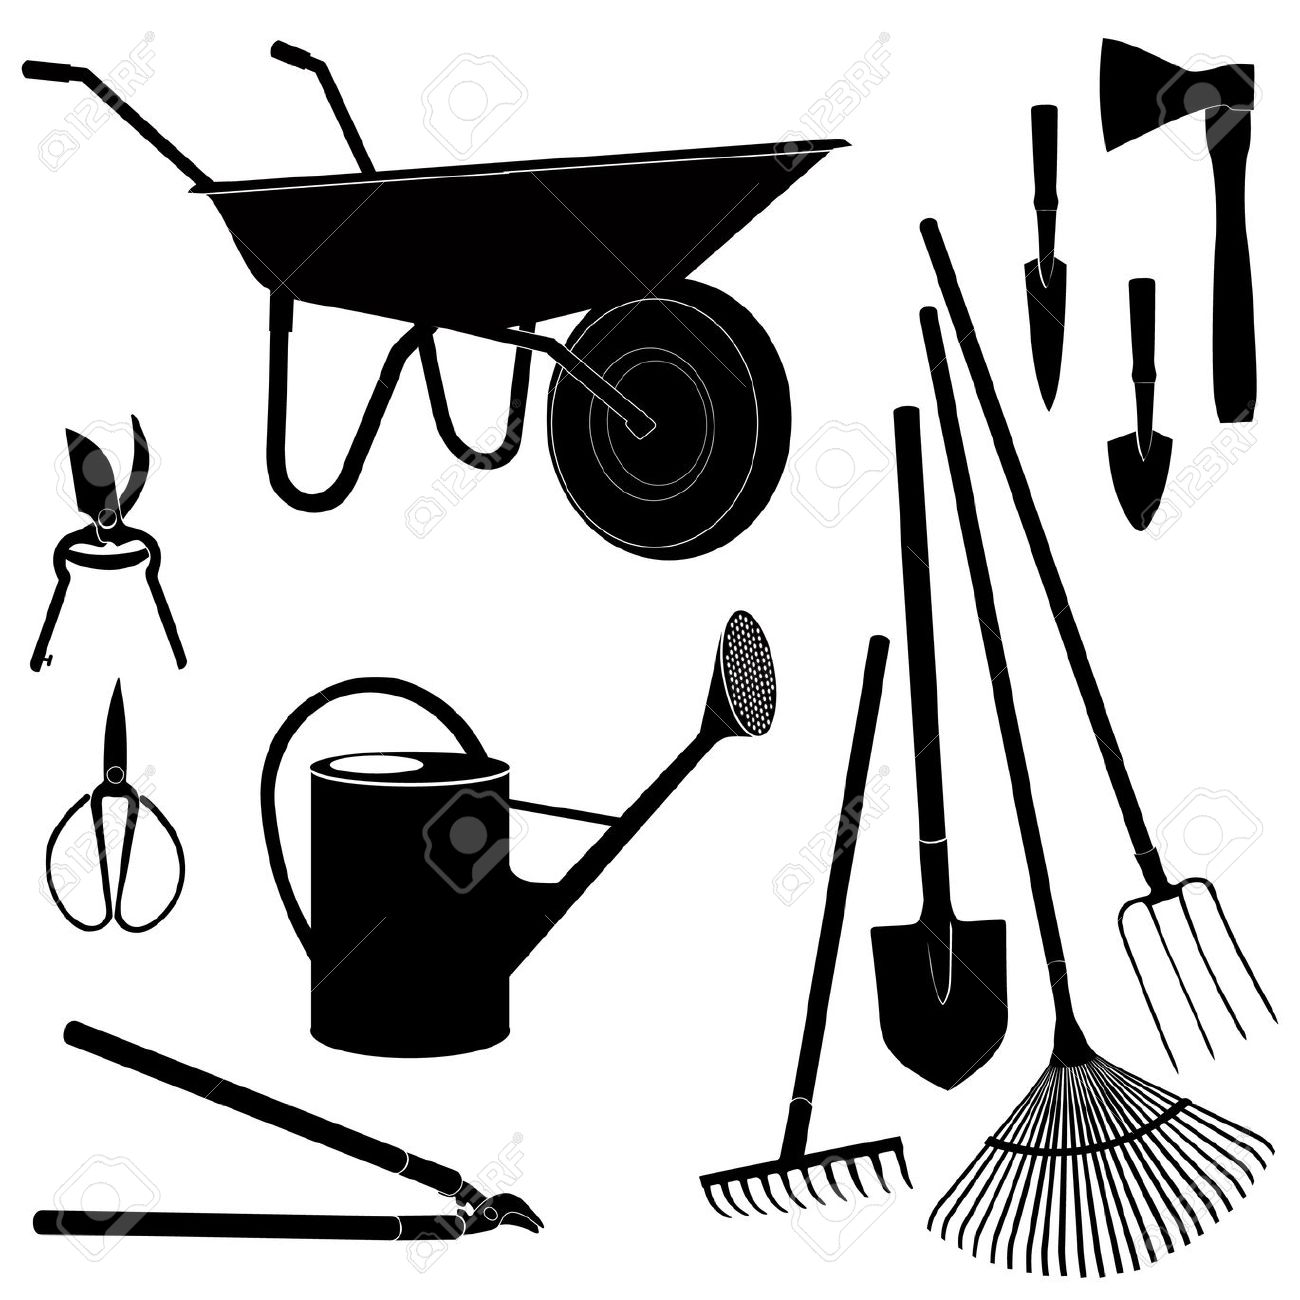 Farm equipments clipart - Clipground